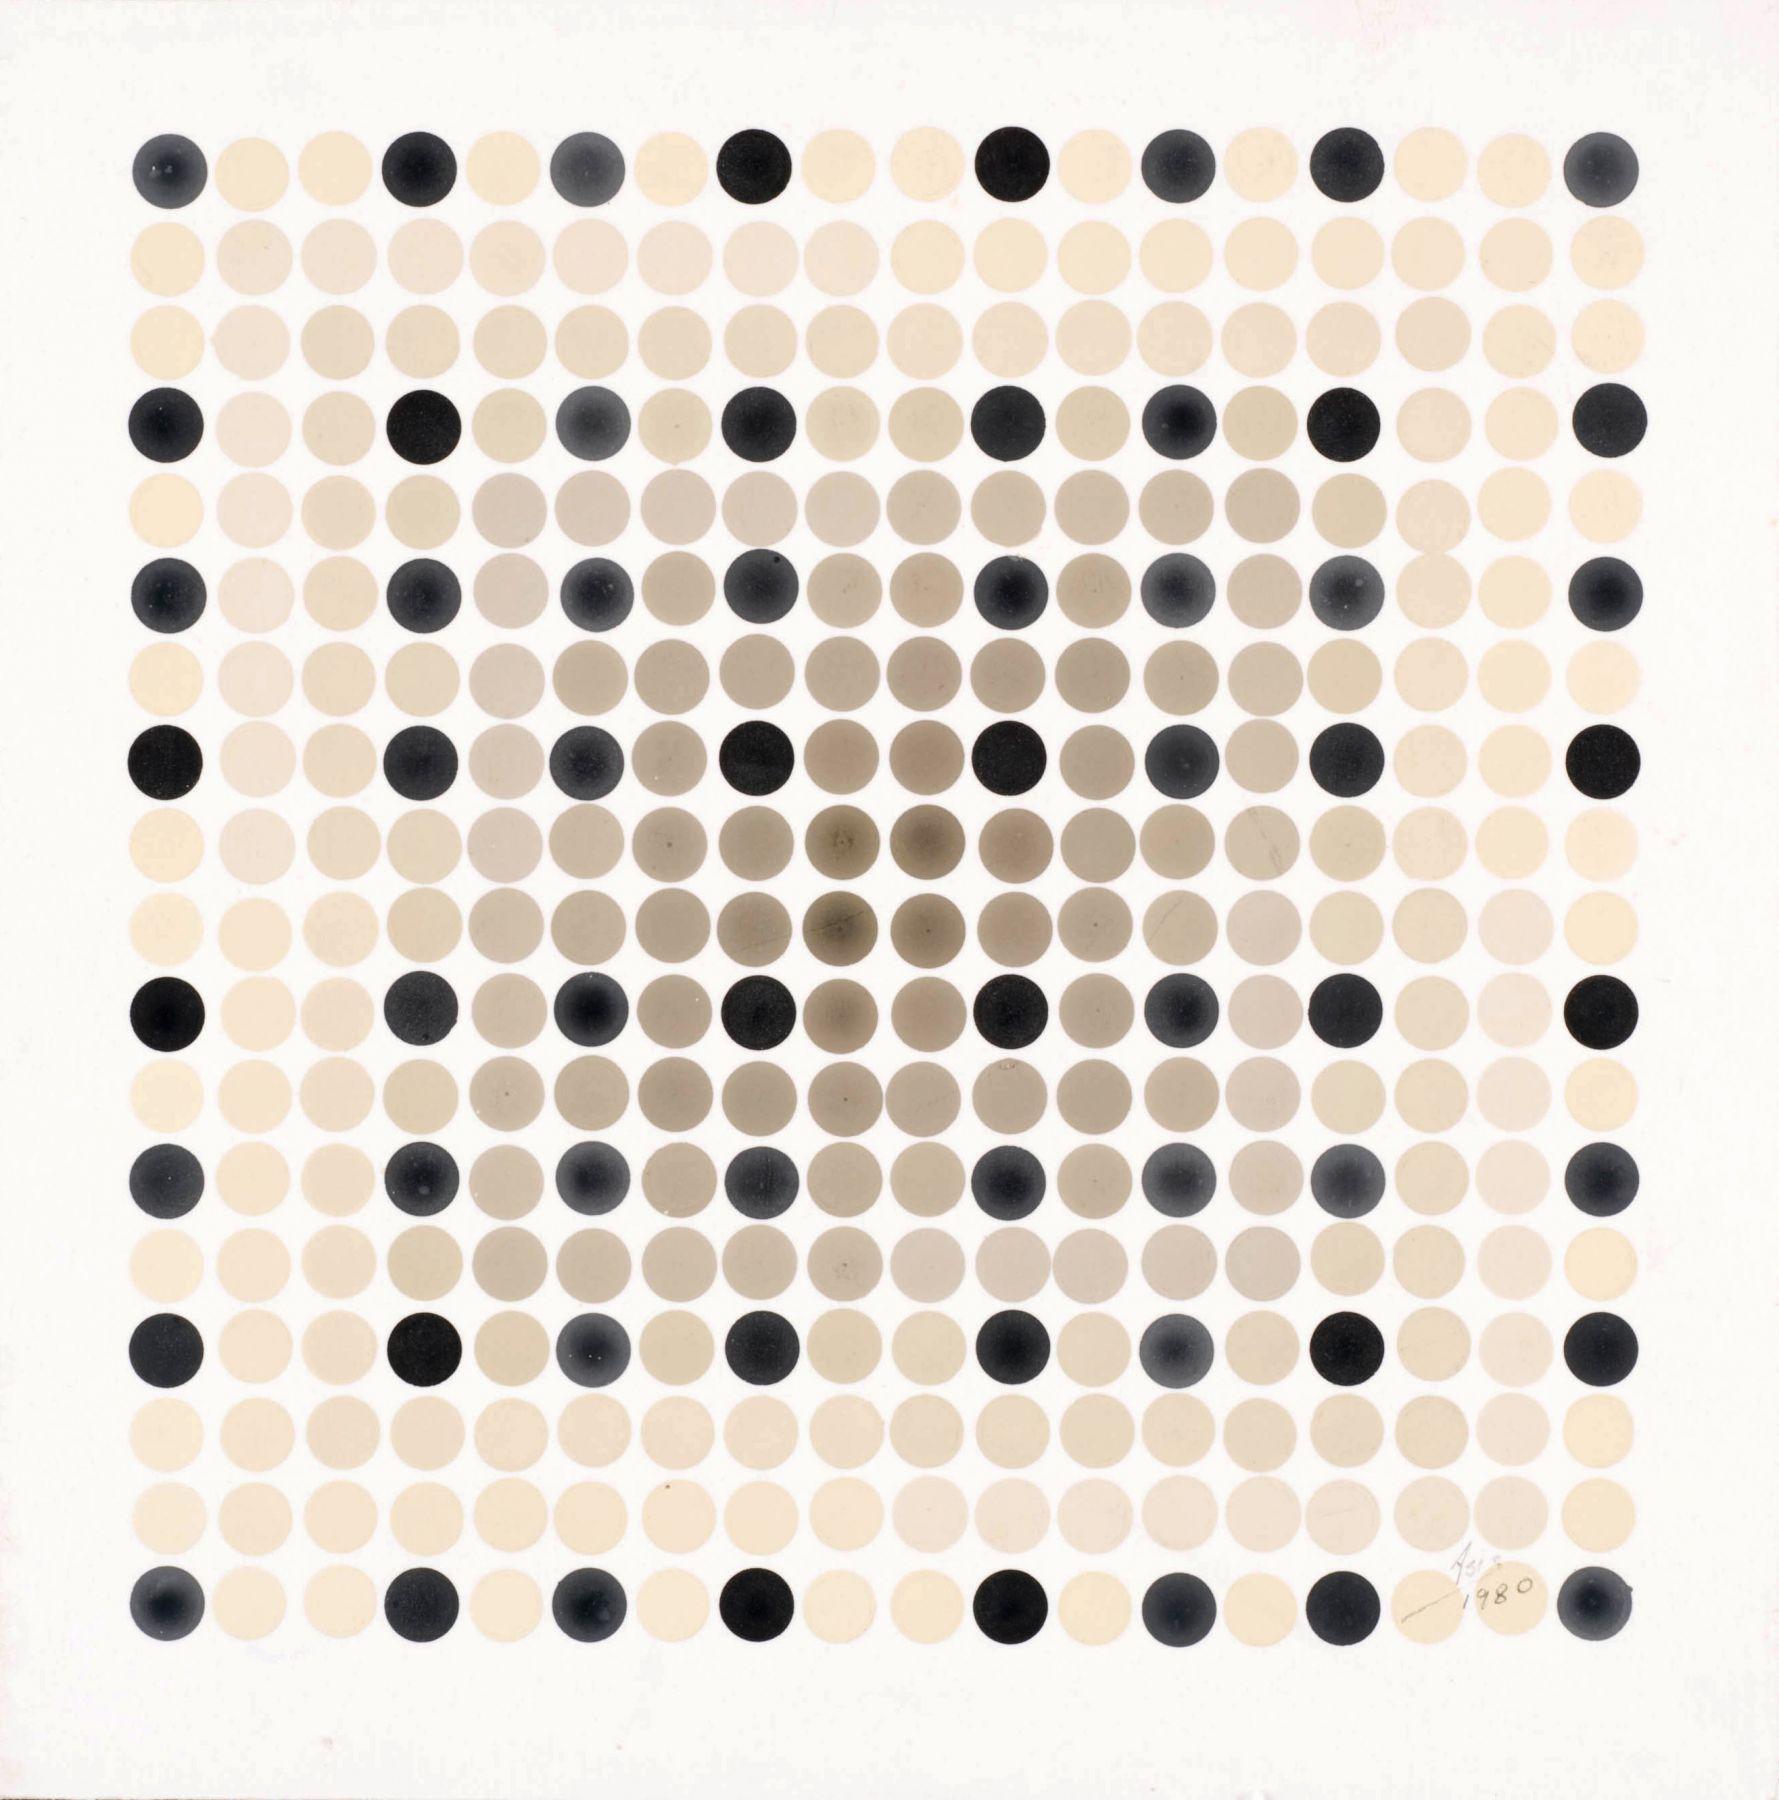 Antonio Asis,Chromatisme en noir etgrisNo. 1251, 1980. 8 1/4 in. x 8 1/4 in.